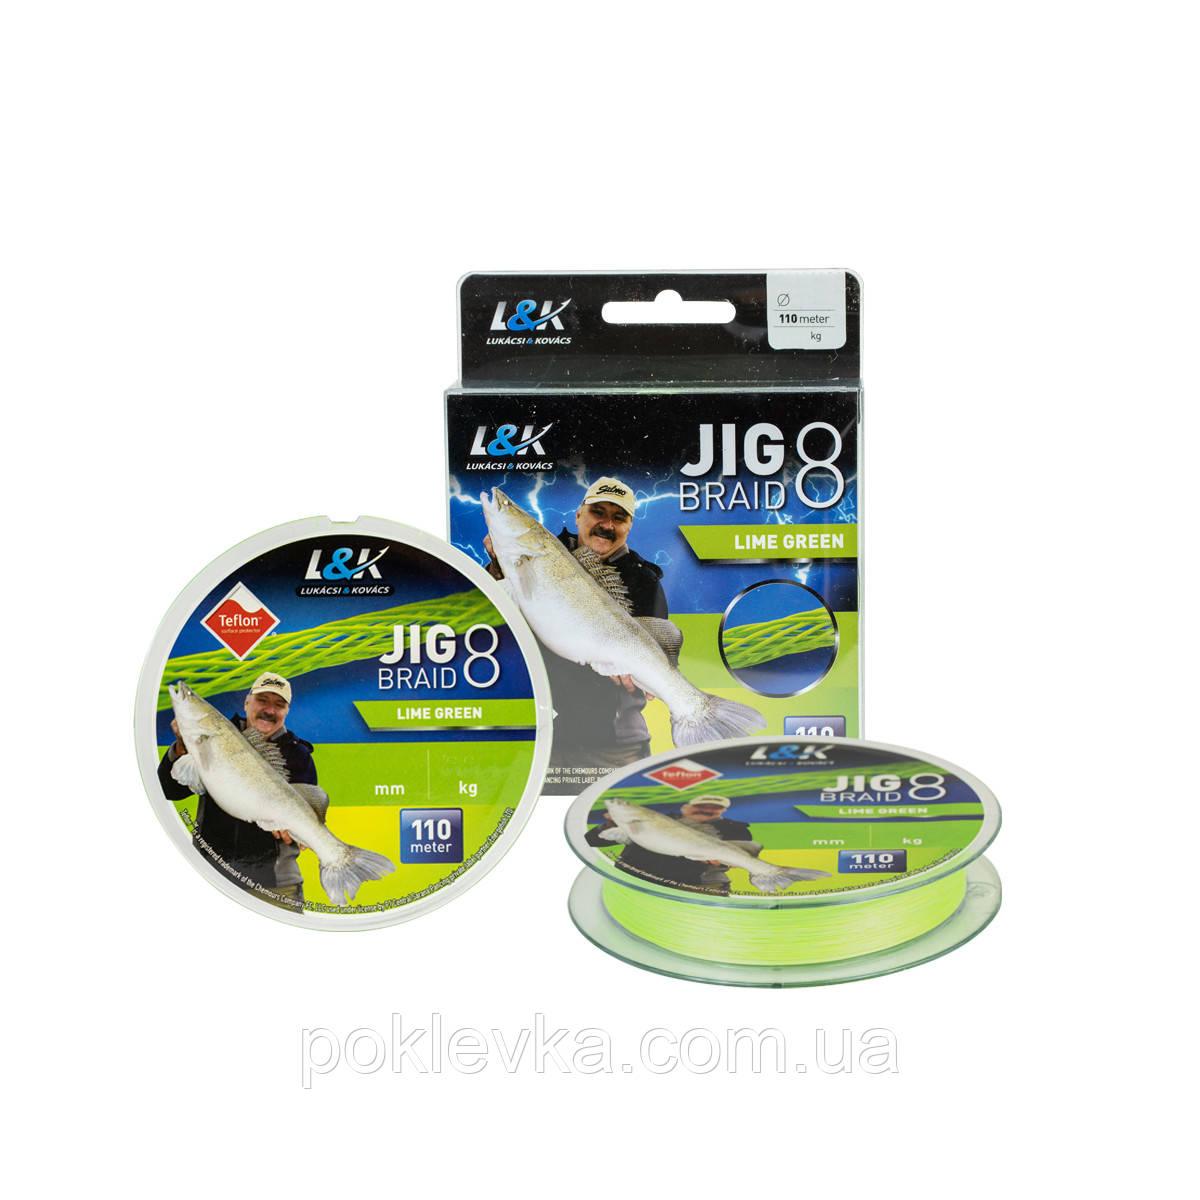 Шнур Energofish L&K X8 JIG BRAID 0,18мм 10.3кг 110м LIME GREEN